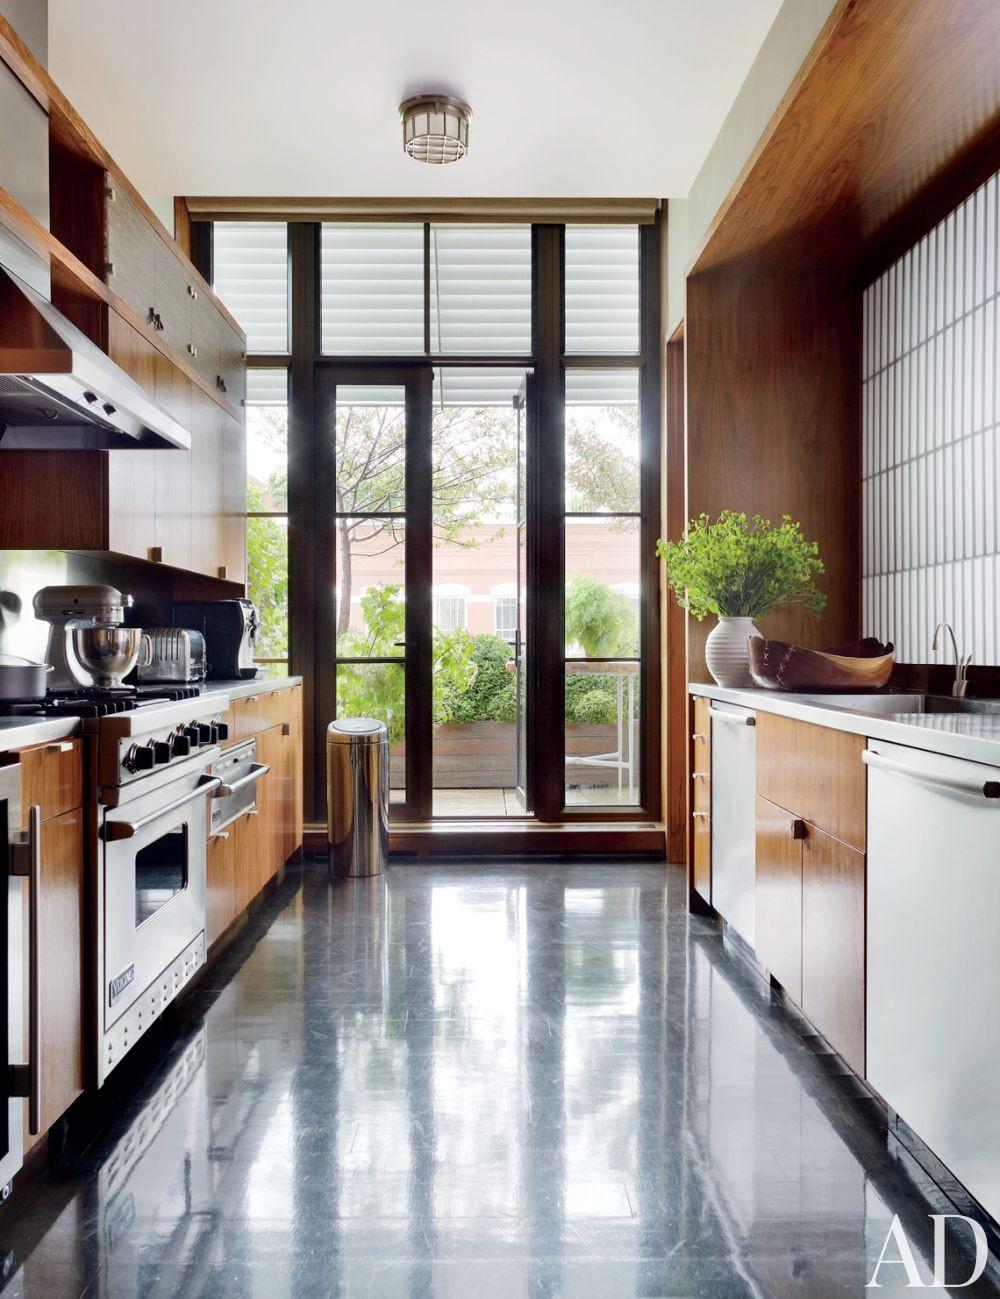 Modern Kitchen by De la Torre Design Studio and Cooper, Robertson & Partners in New York, New York